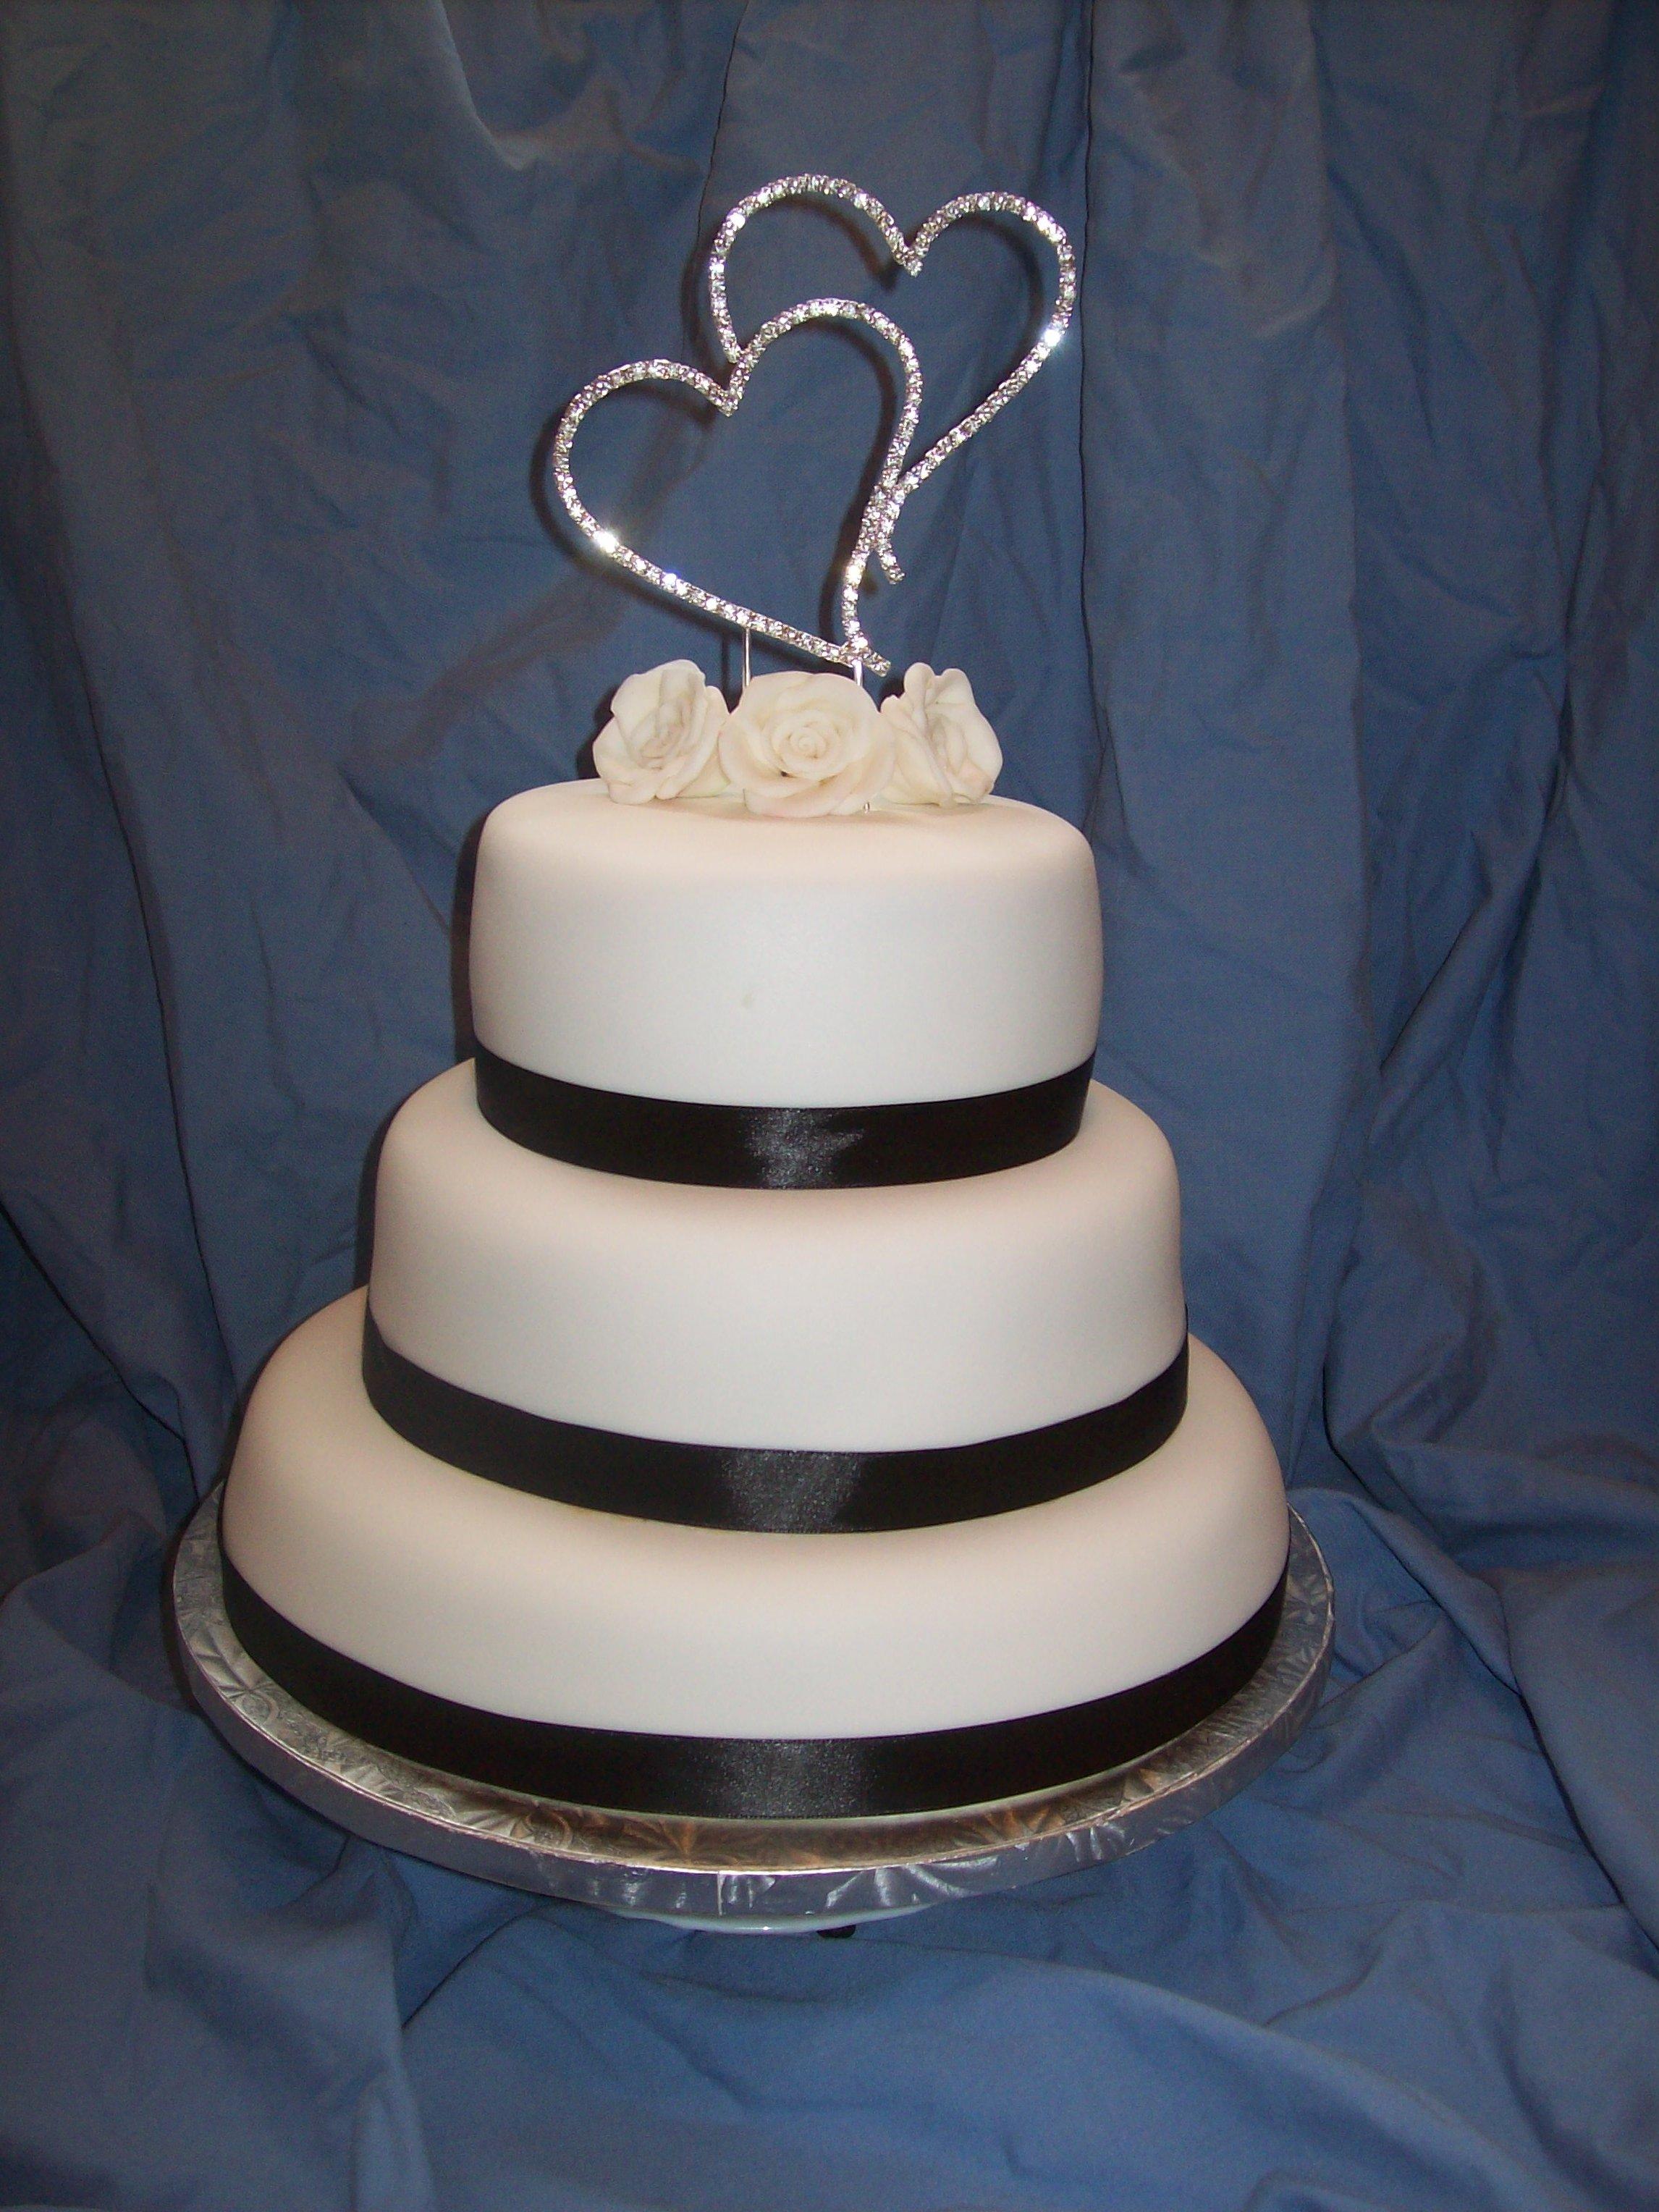 3 tier Bling Wedding Cake $650 • Temptation Cakes